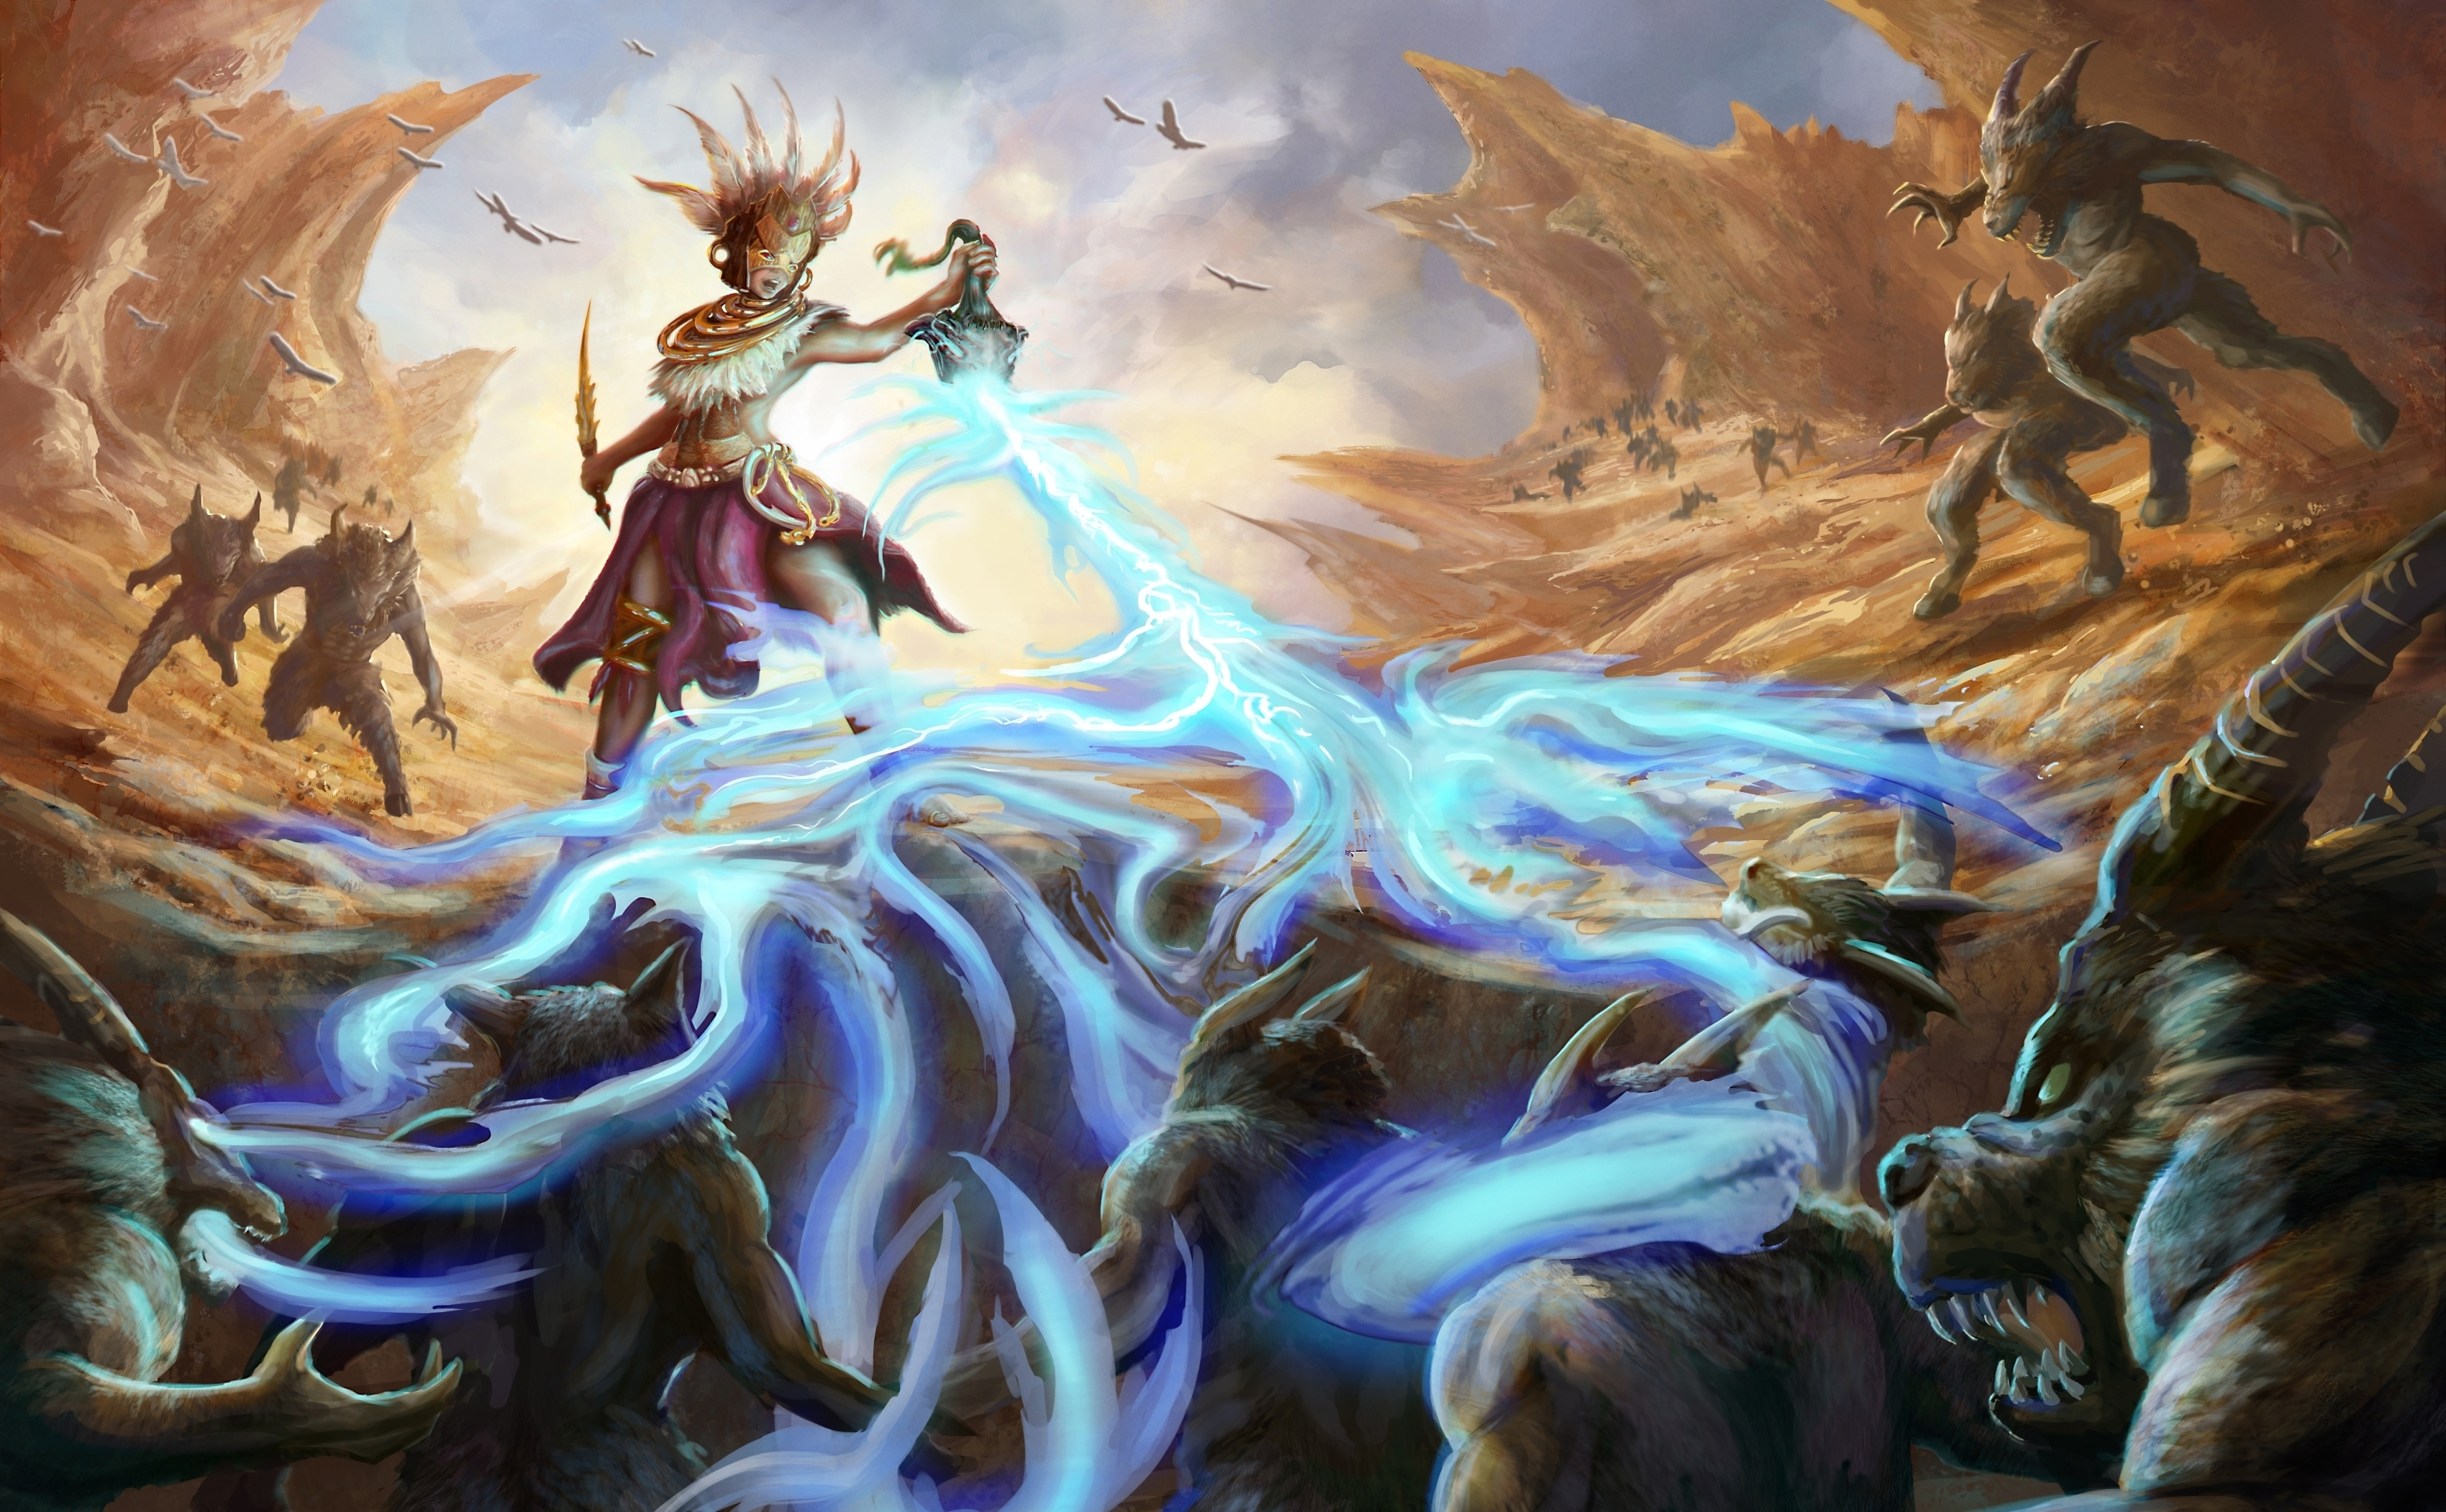 wizard battle wallpaper - photo #1